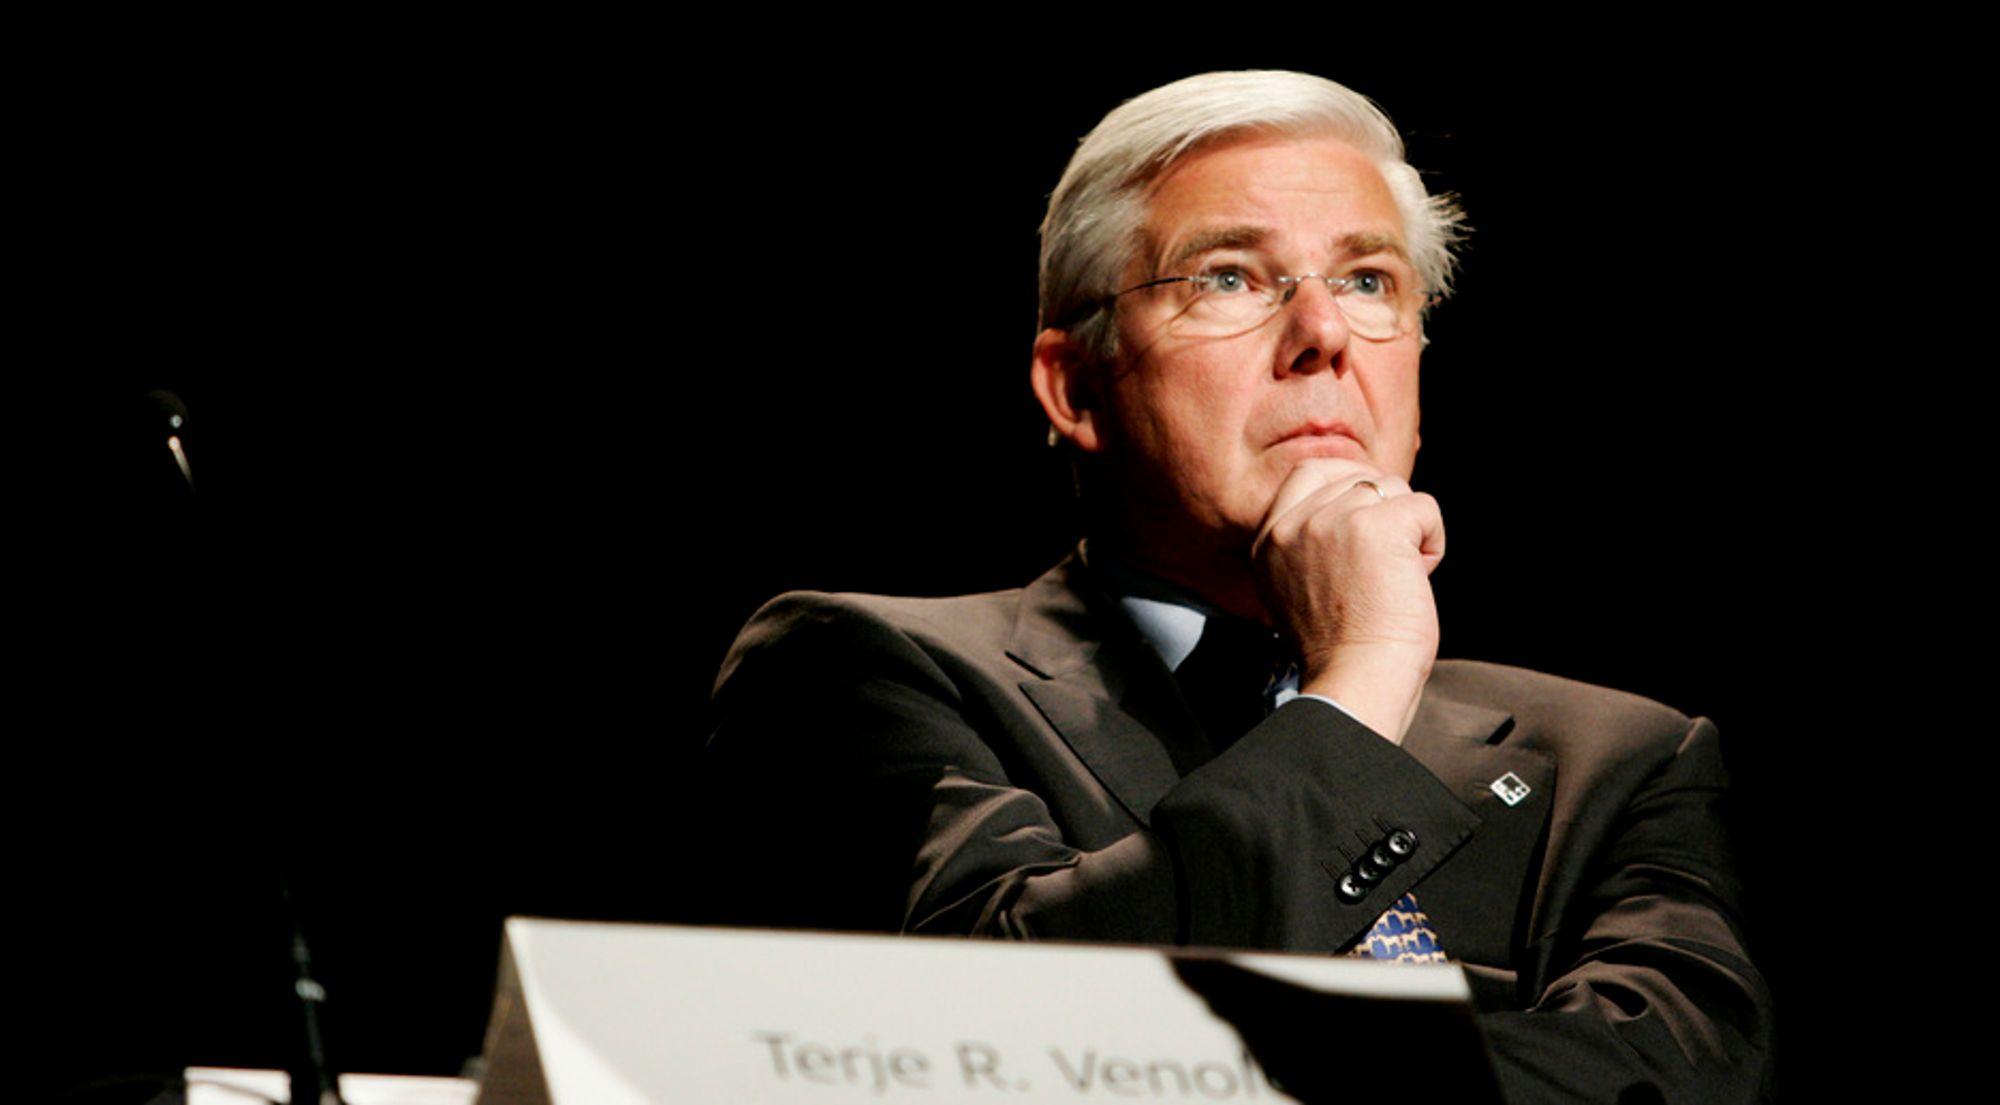 Terje R. Venold er konsernsjef i Veidekke ASA.